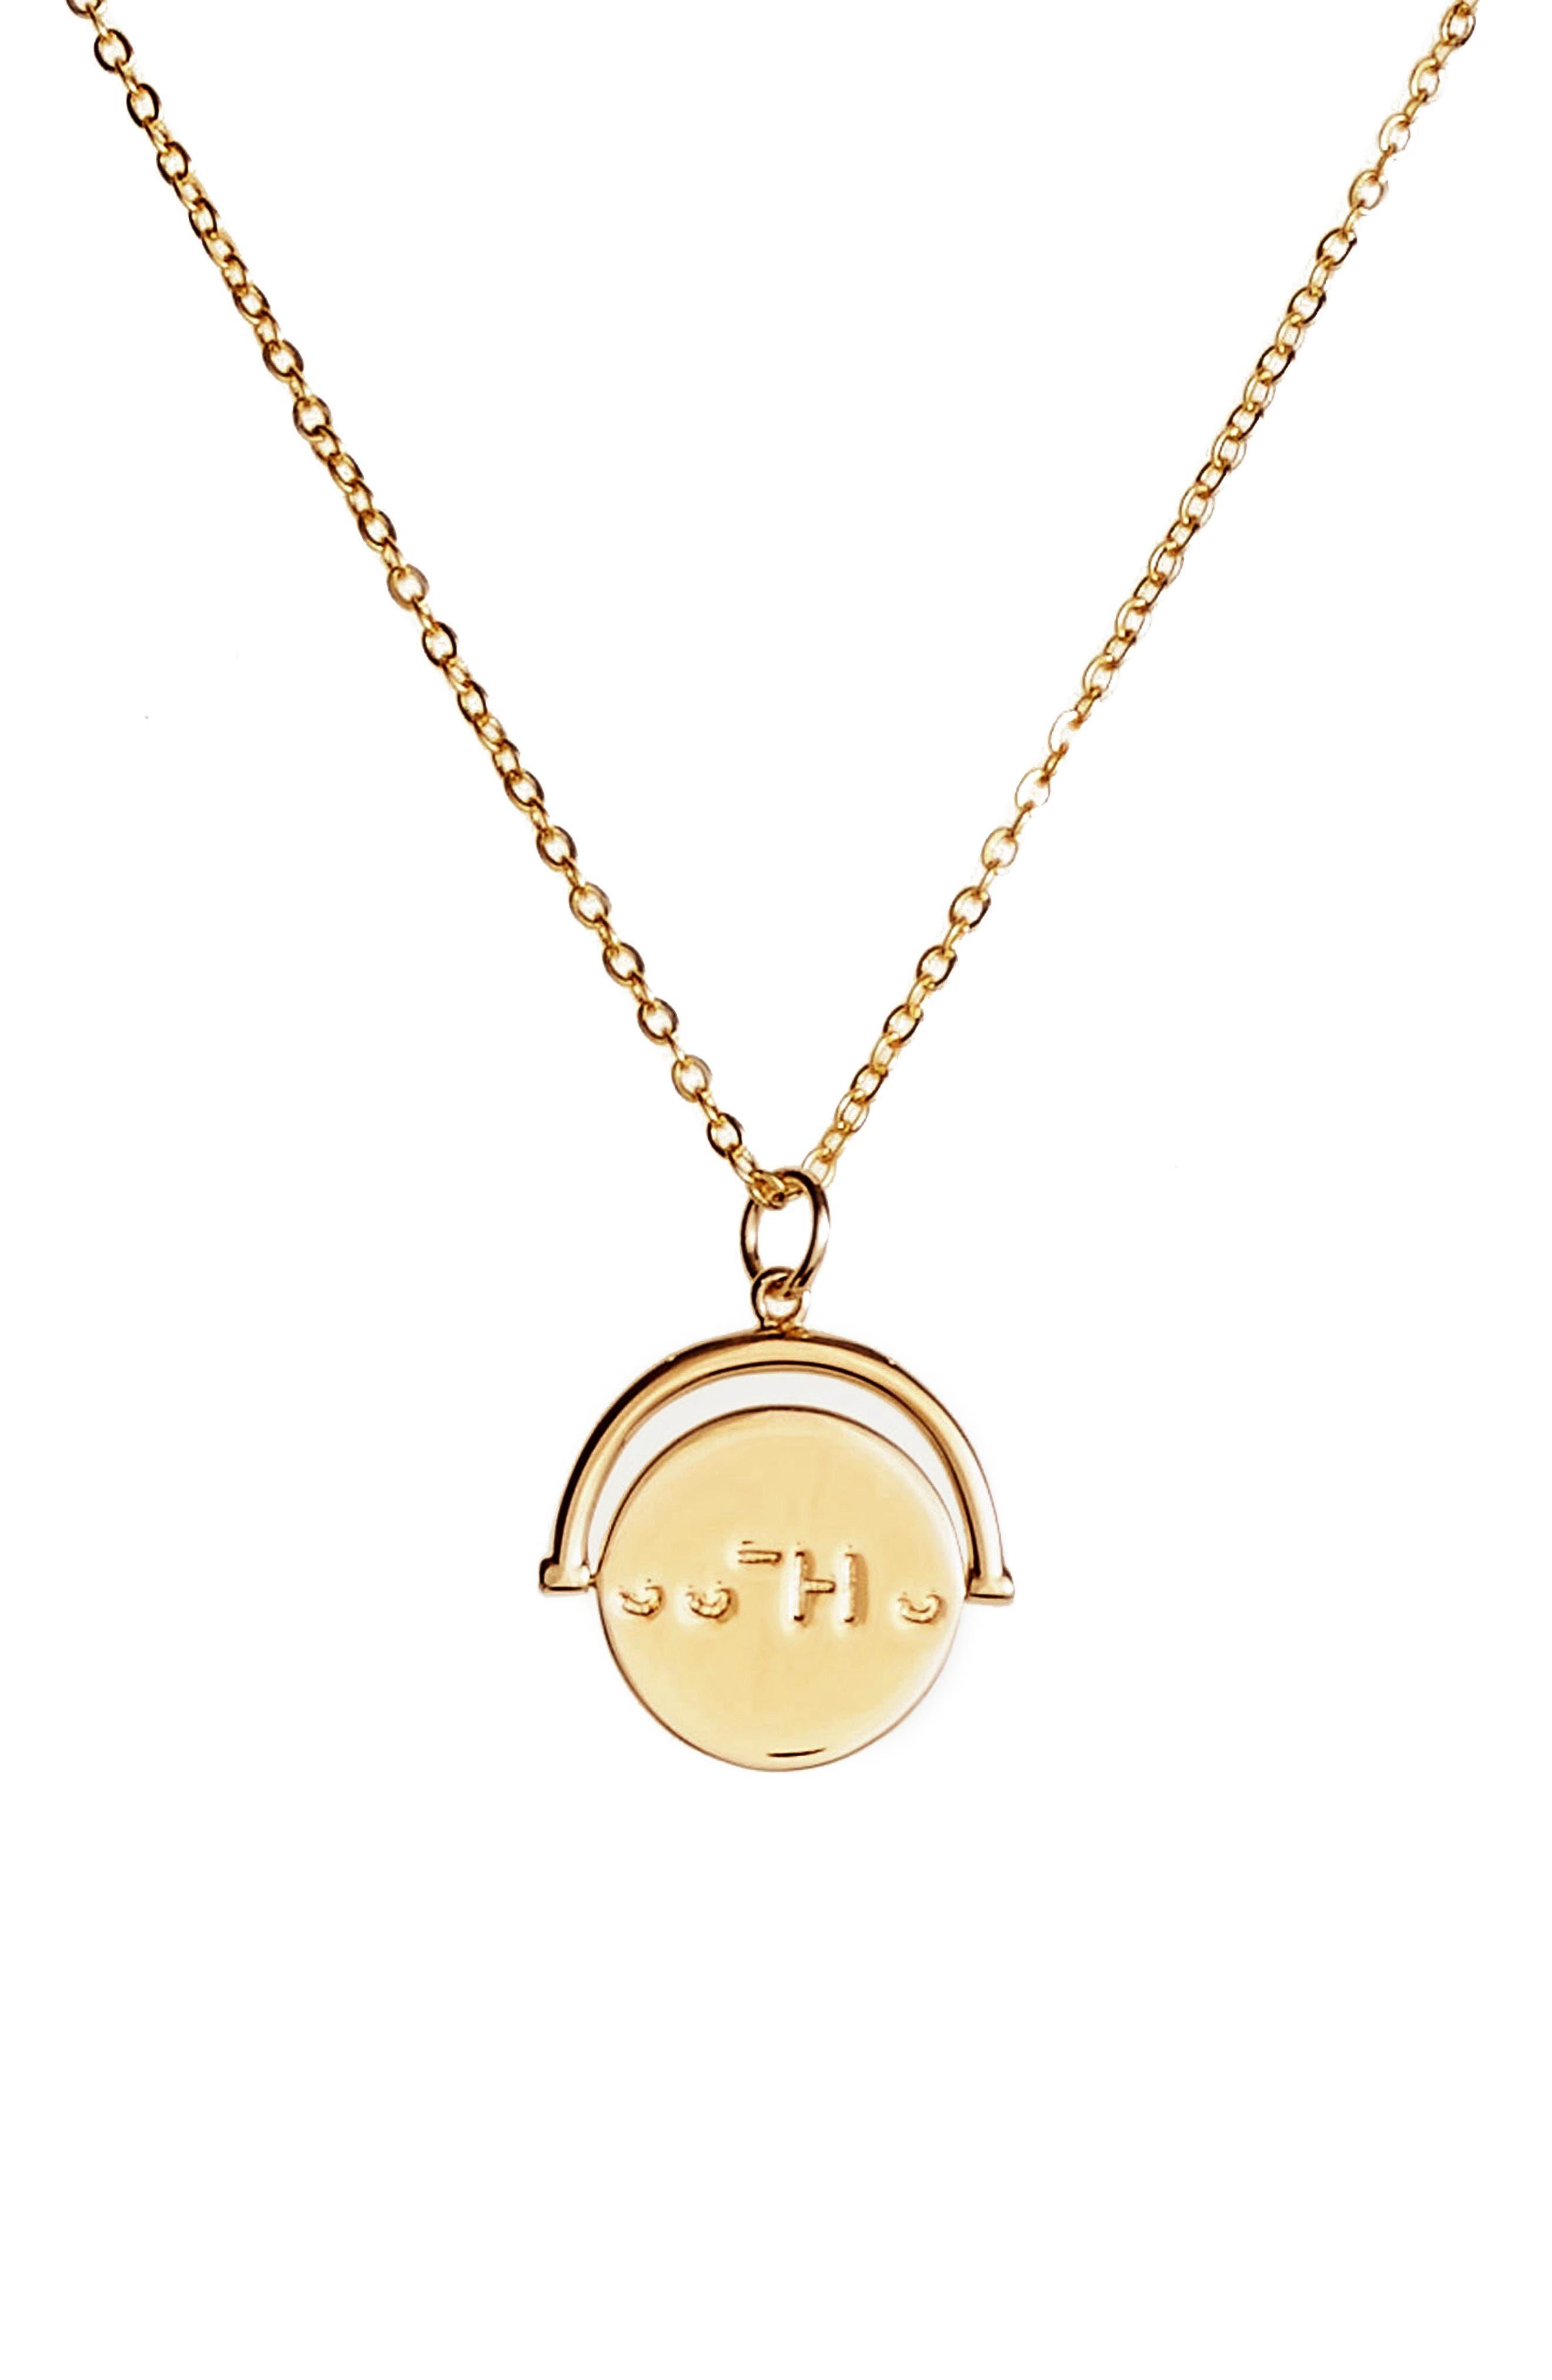 LULU DK Sisters Love Code Charm Necklace